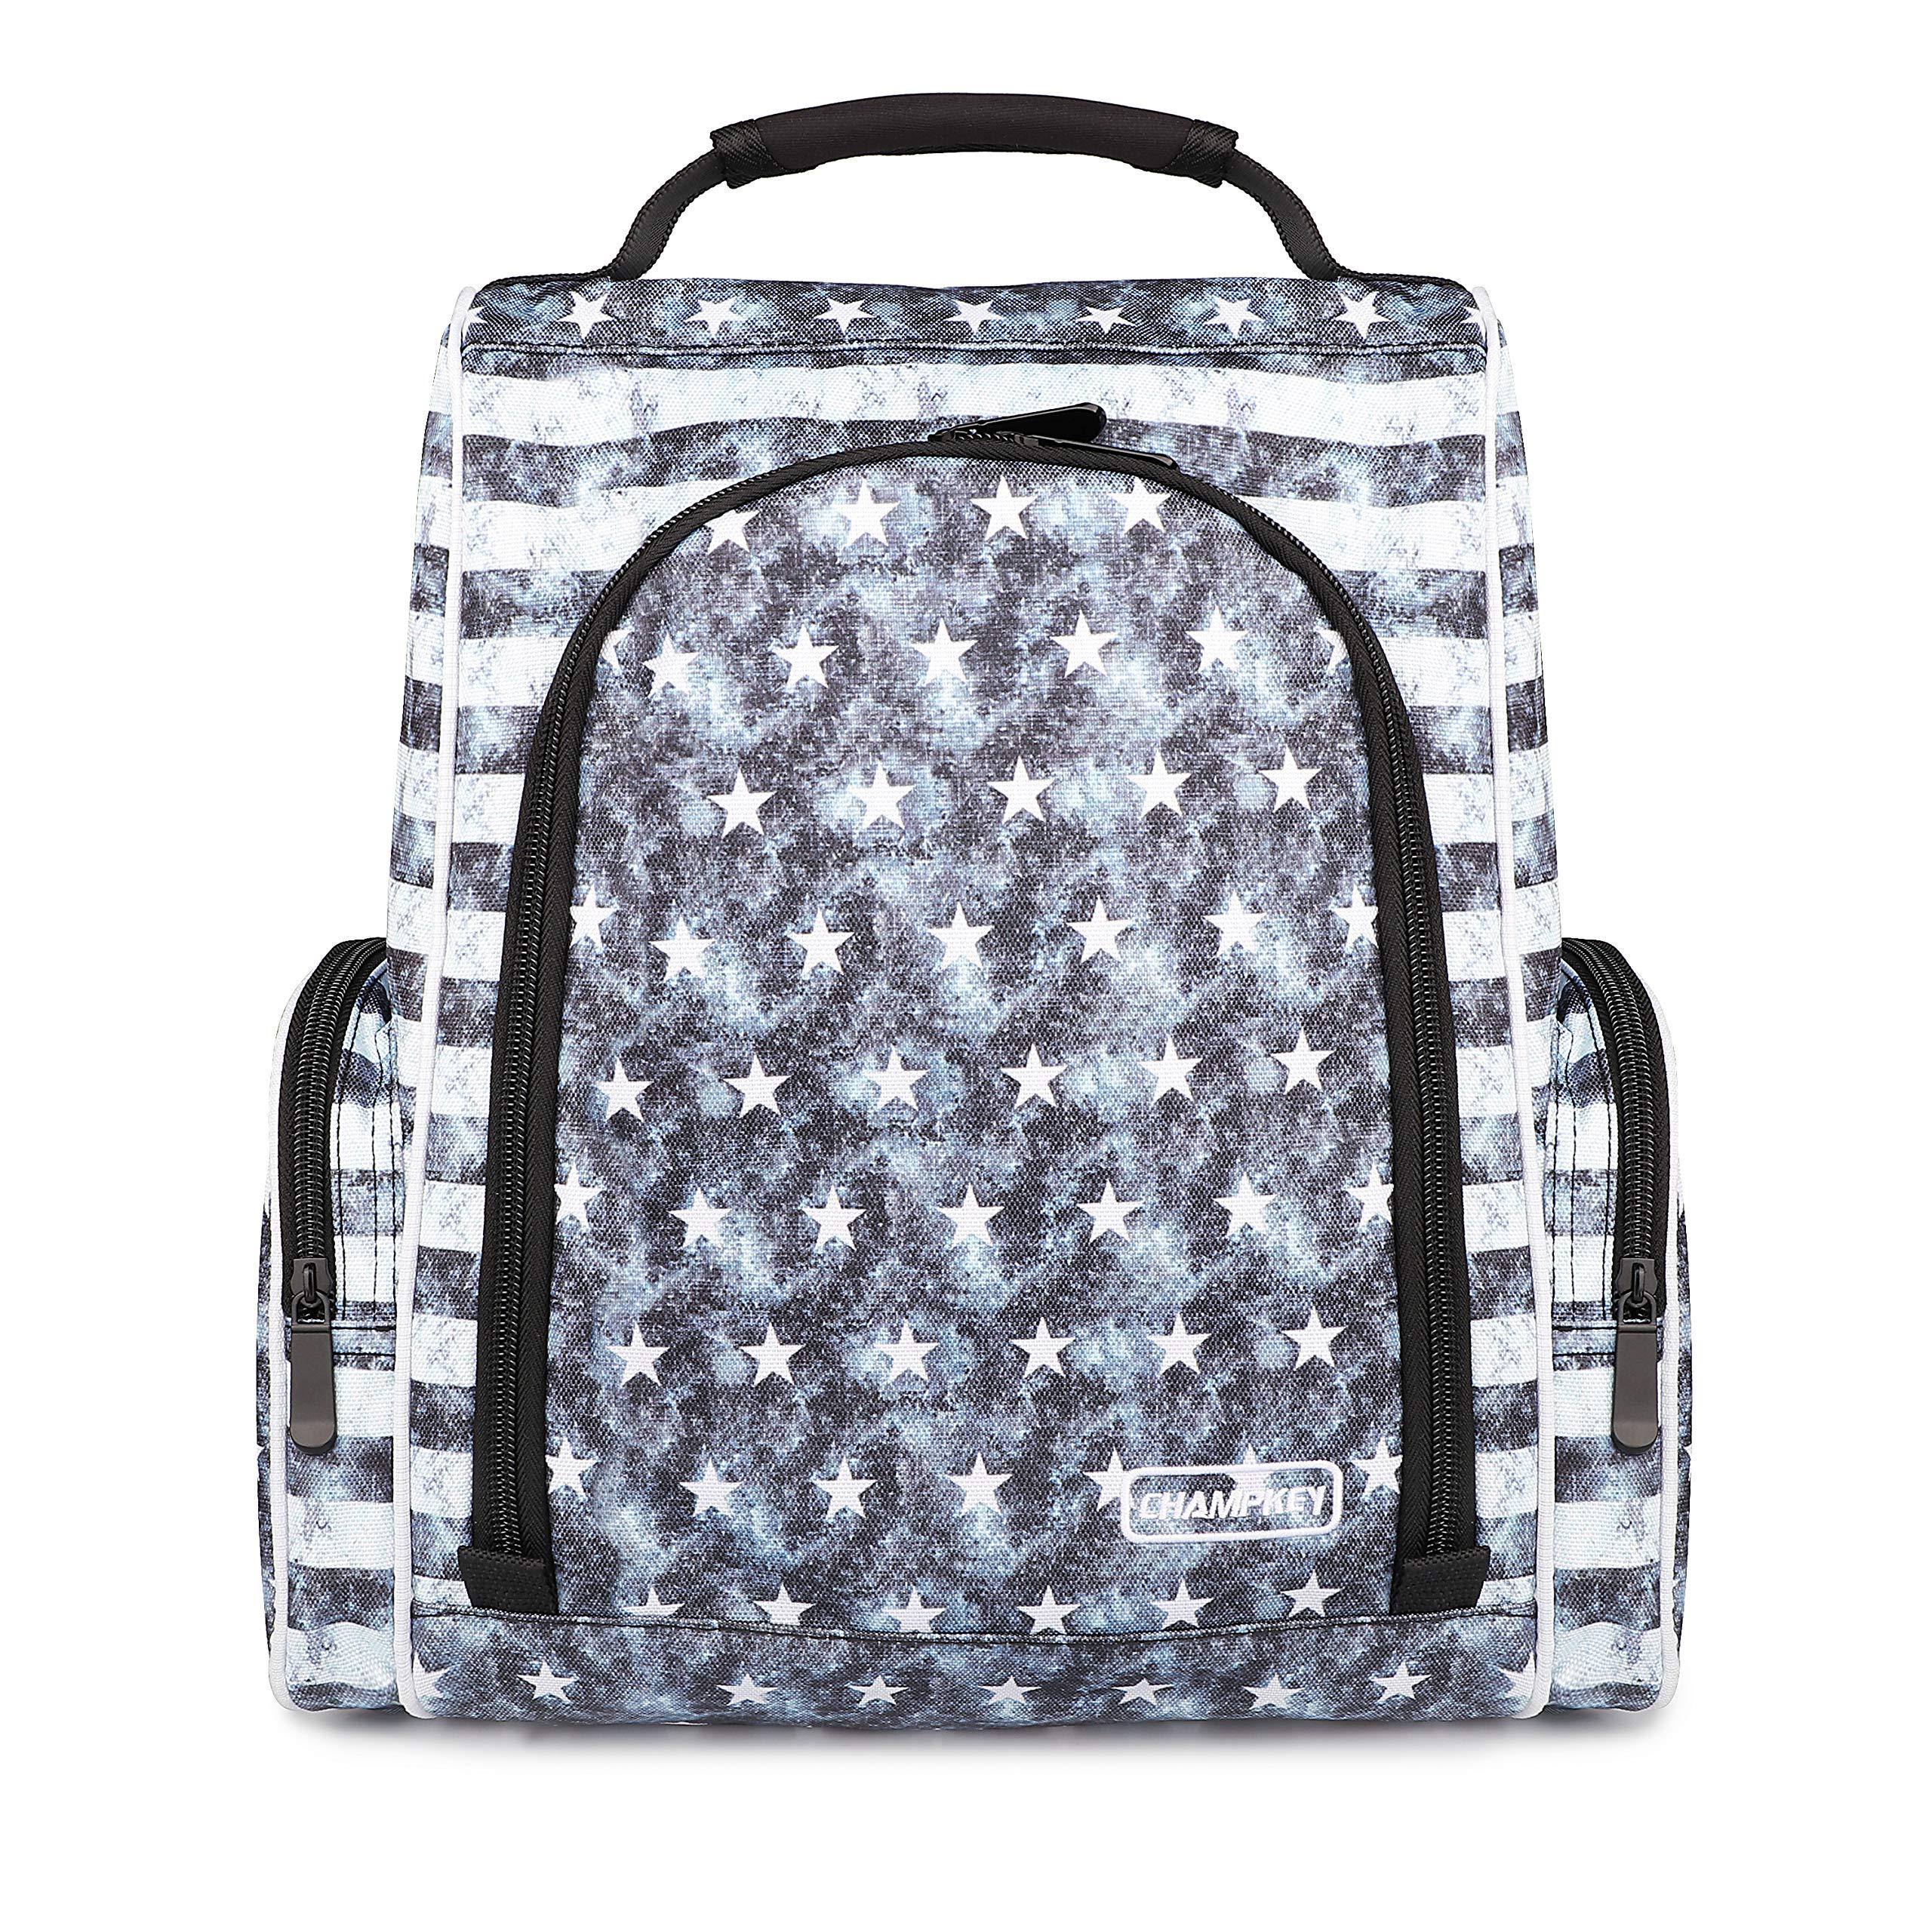 Champkey Custom Golf Shoe Bag - Zippered Shoe Carrier Bags with Outside Pocket for Socks, Tees,Divot,Mark etc. (USA-Hero, S(5-12 US Size)) by Champkey